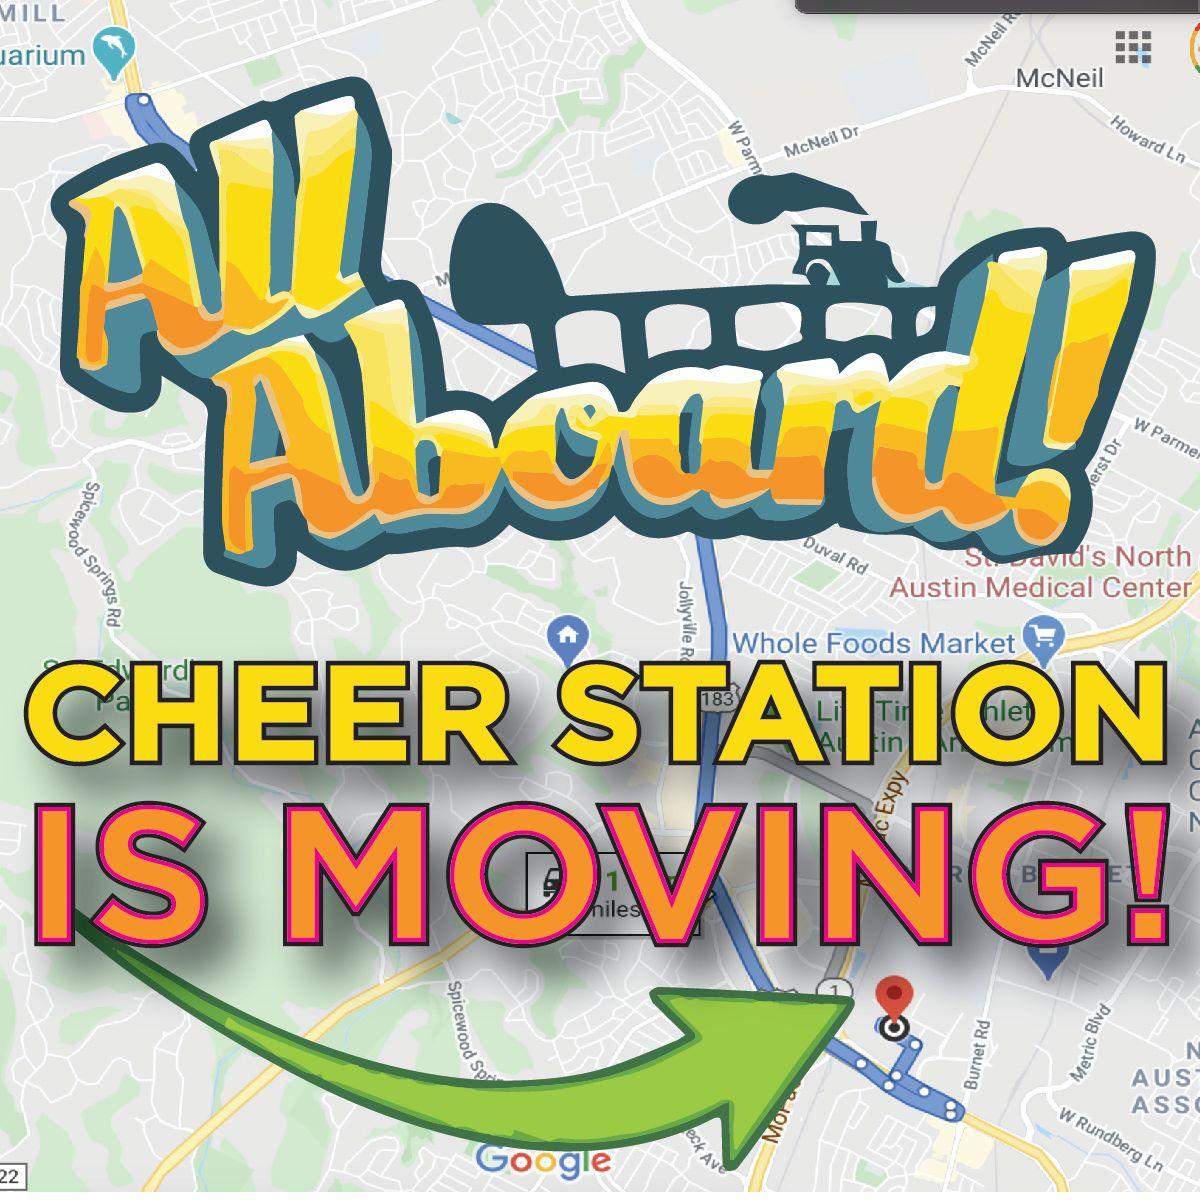 Cheer Station Move Image-01.jpg